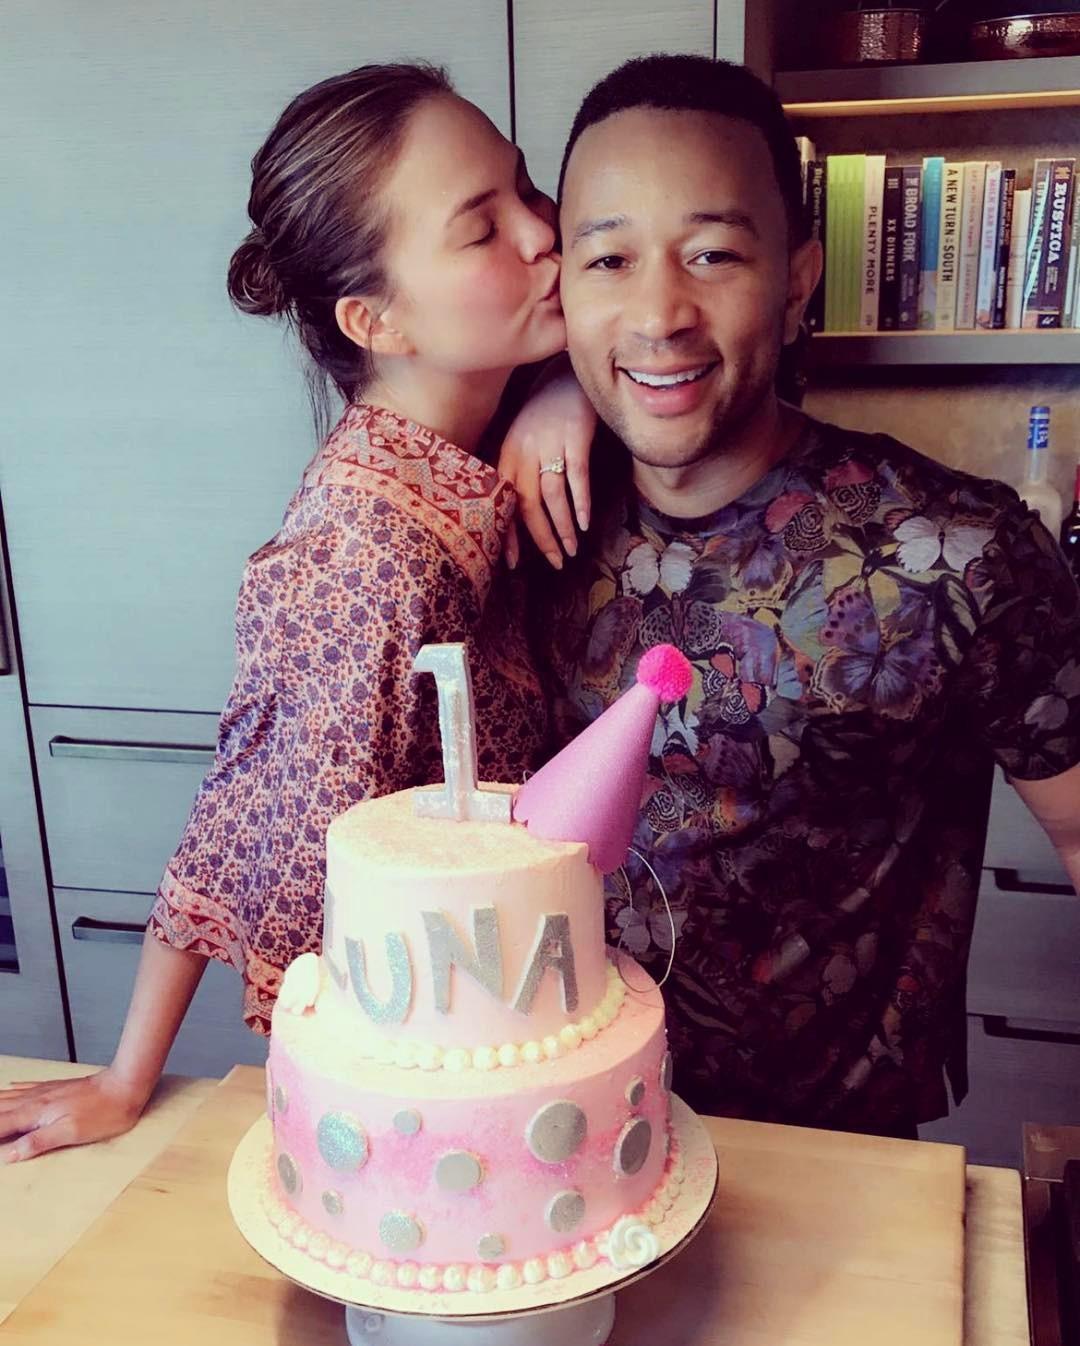 Chrissy Teigen And John Legend's Daughter Luna Enjoyed Her Birthday As She Clocked 1 - 2